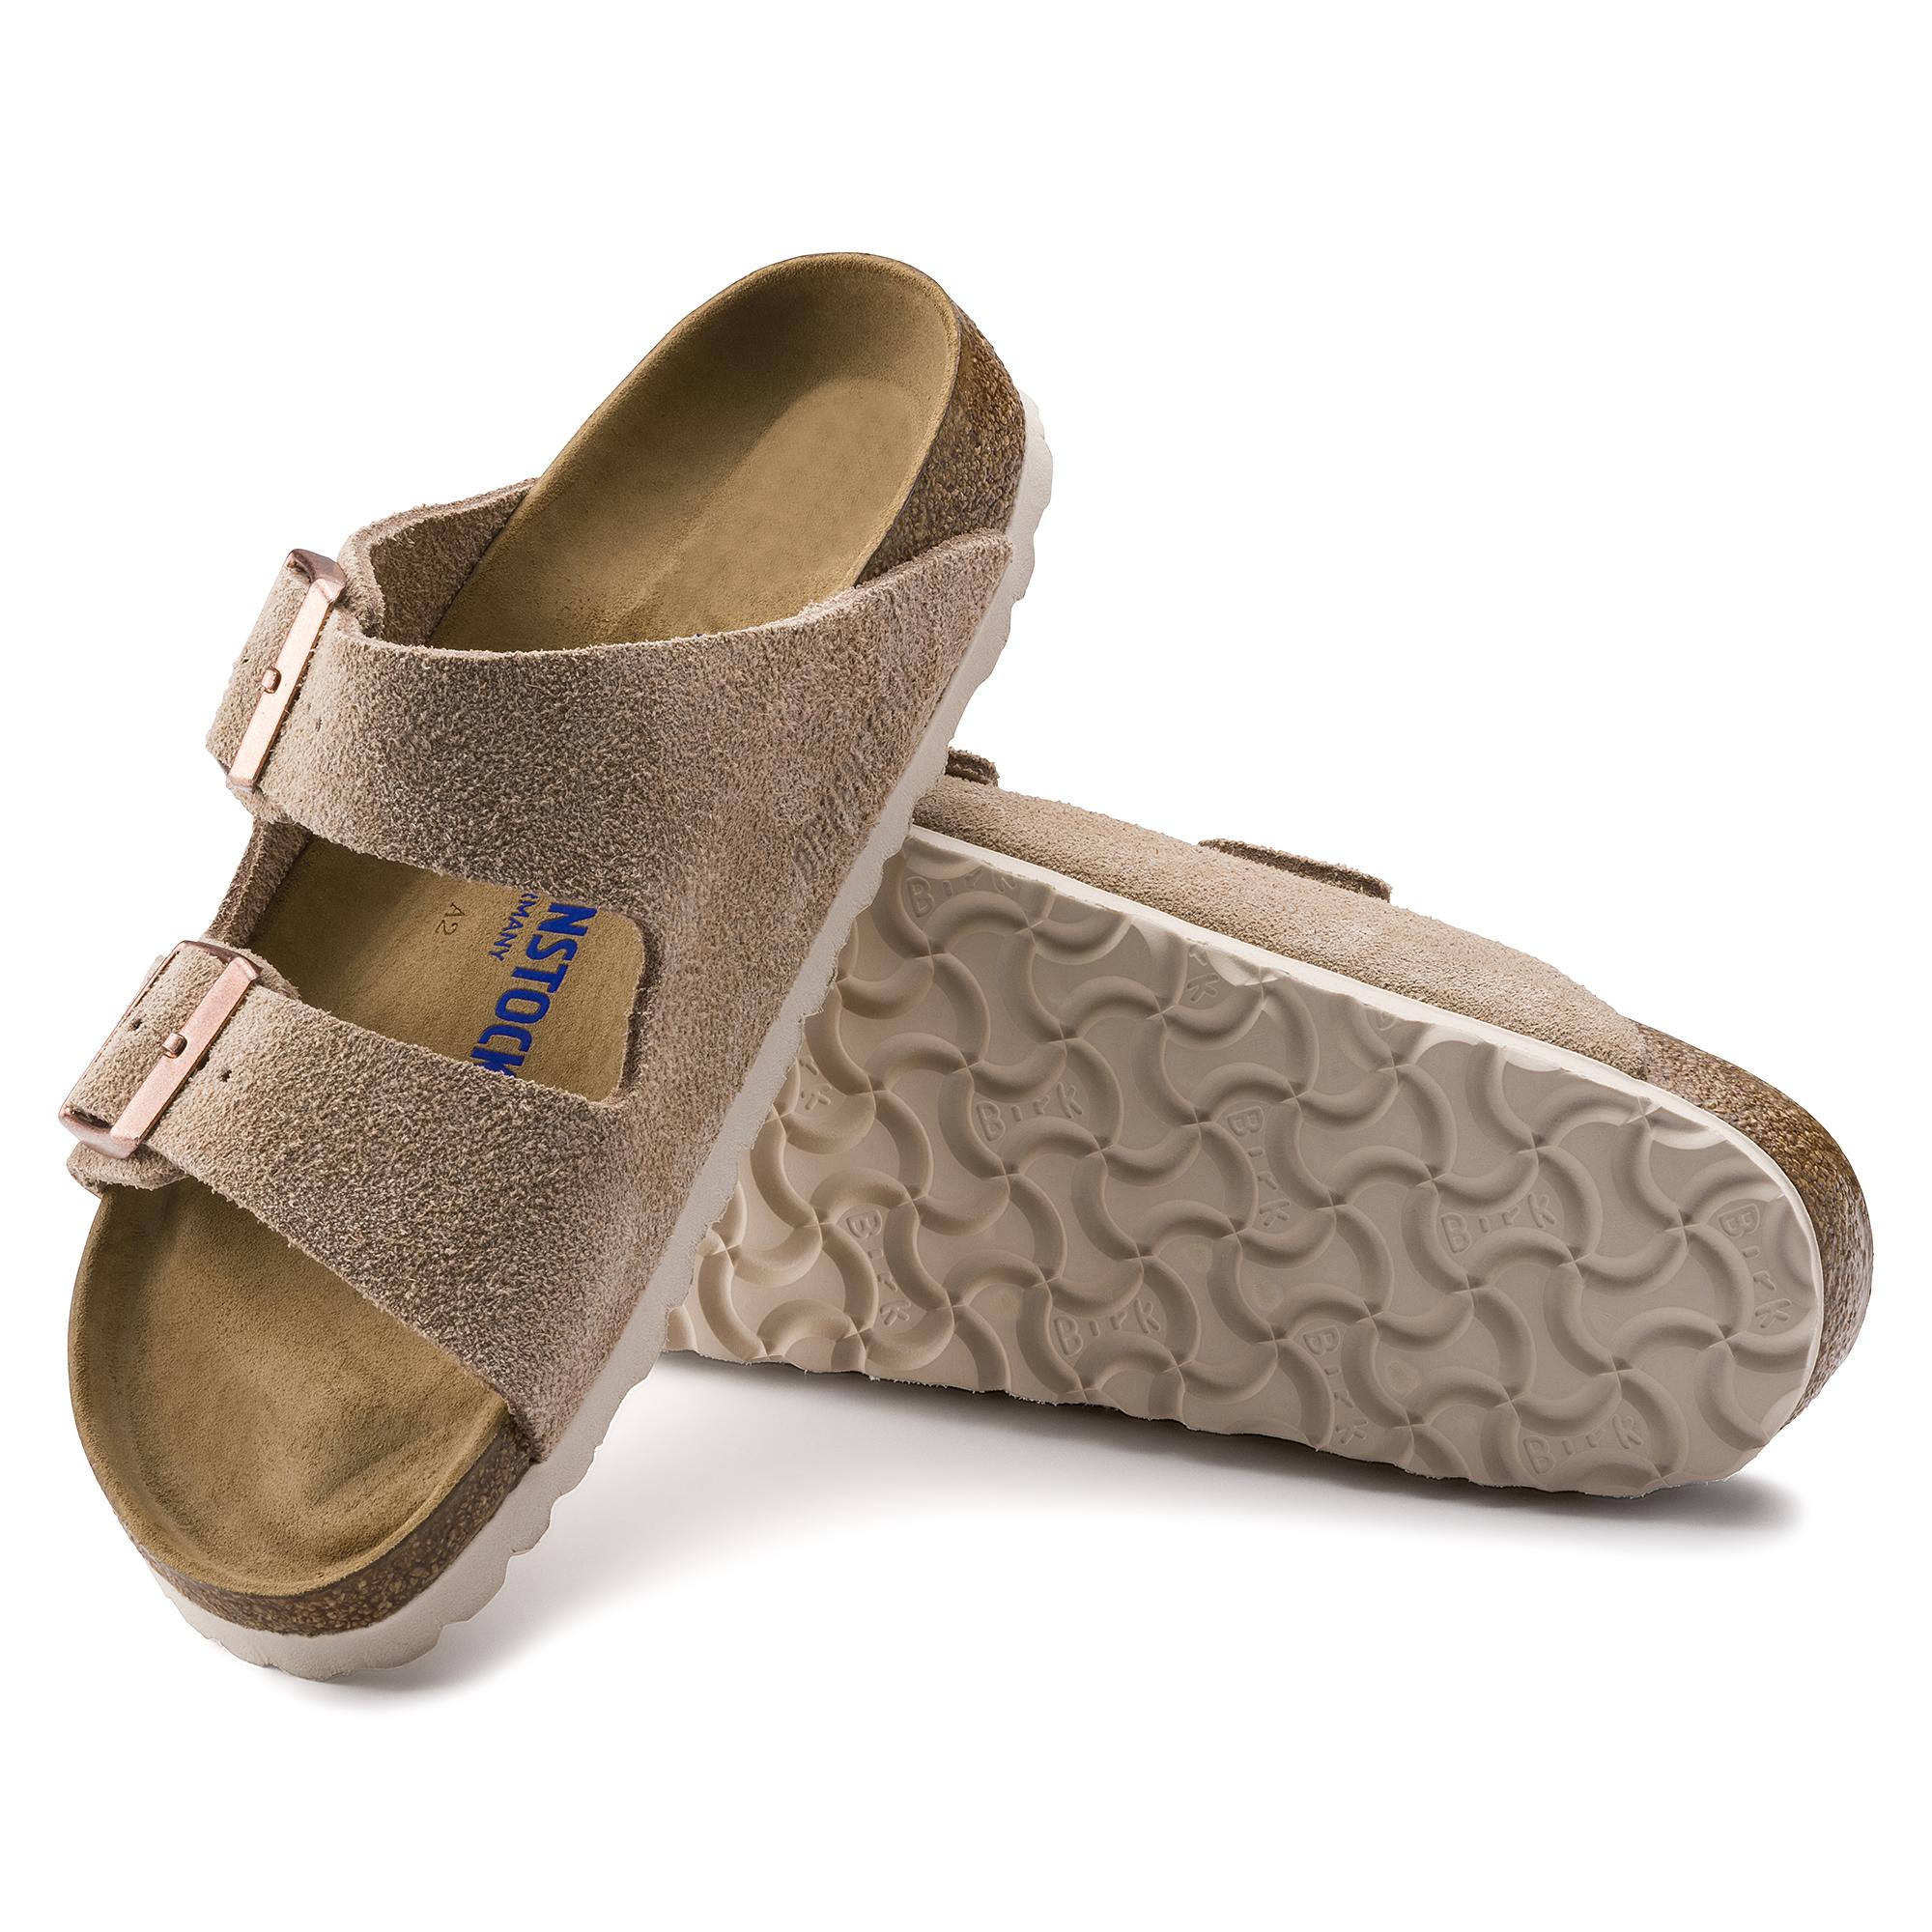 Birkenstock Arizona Soft Footbed Suede Leather   Nude